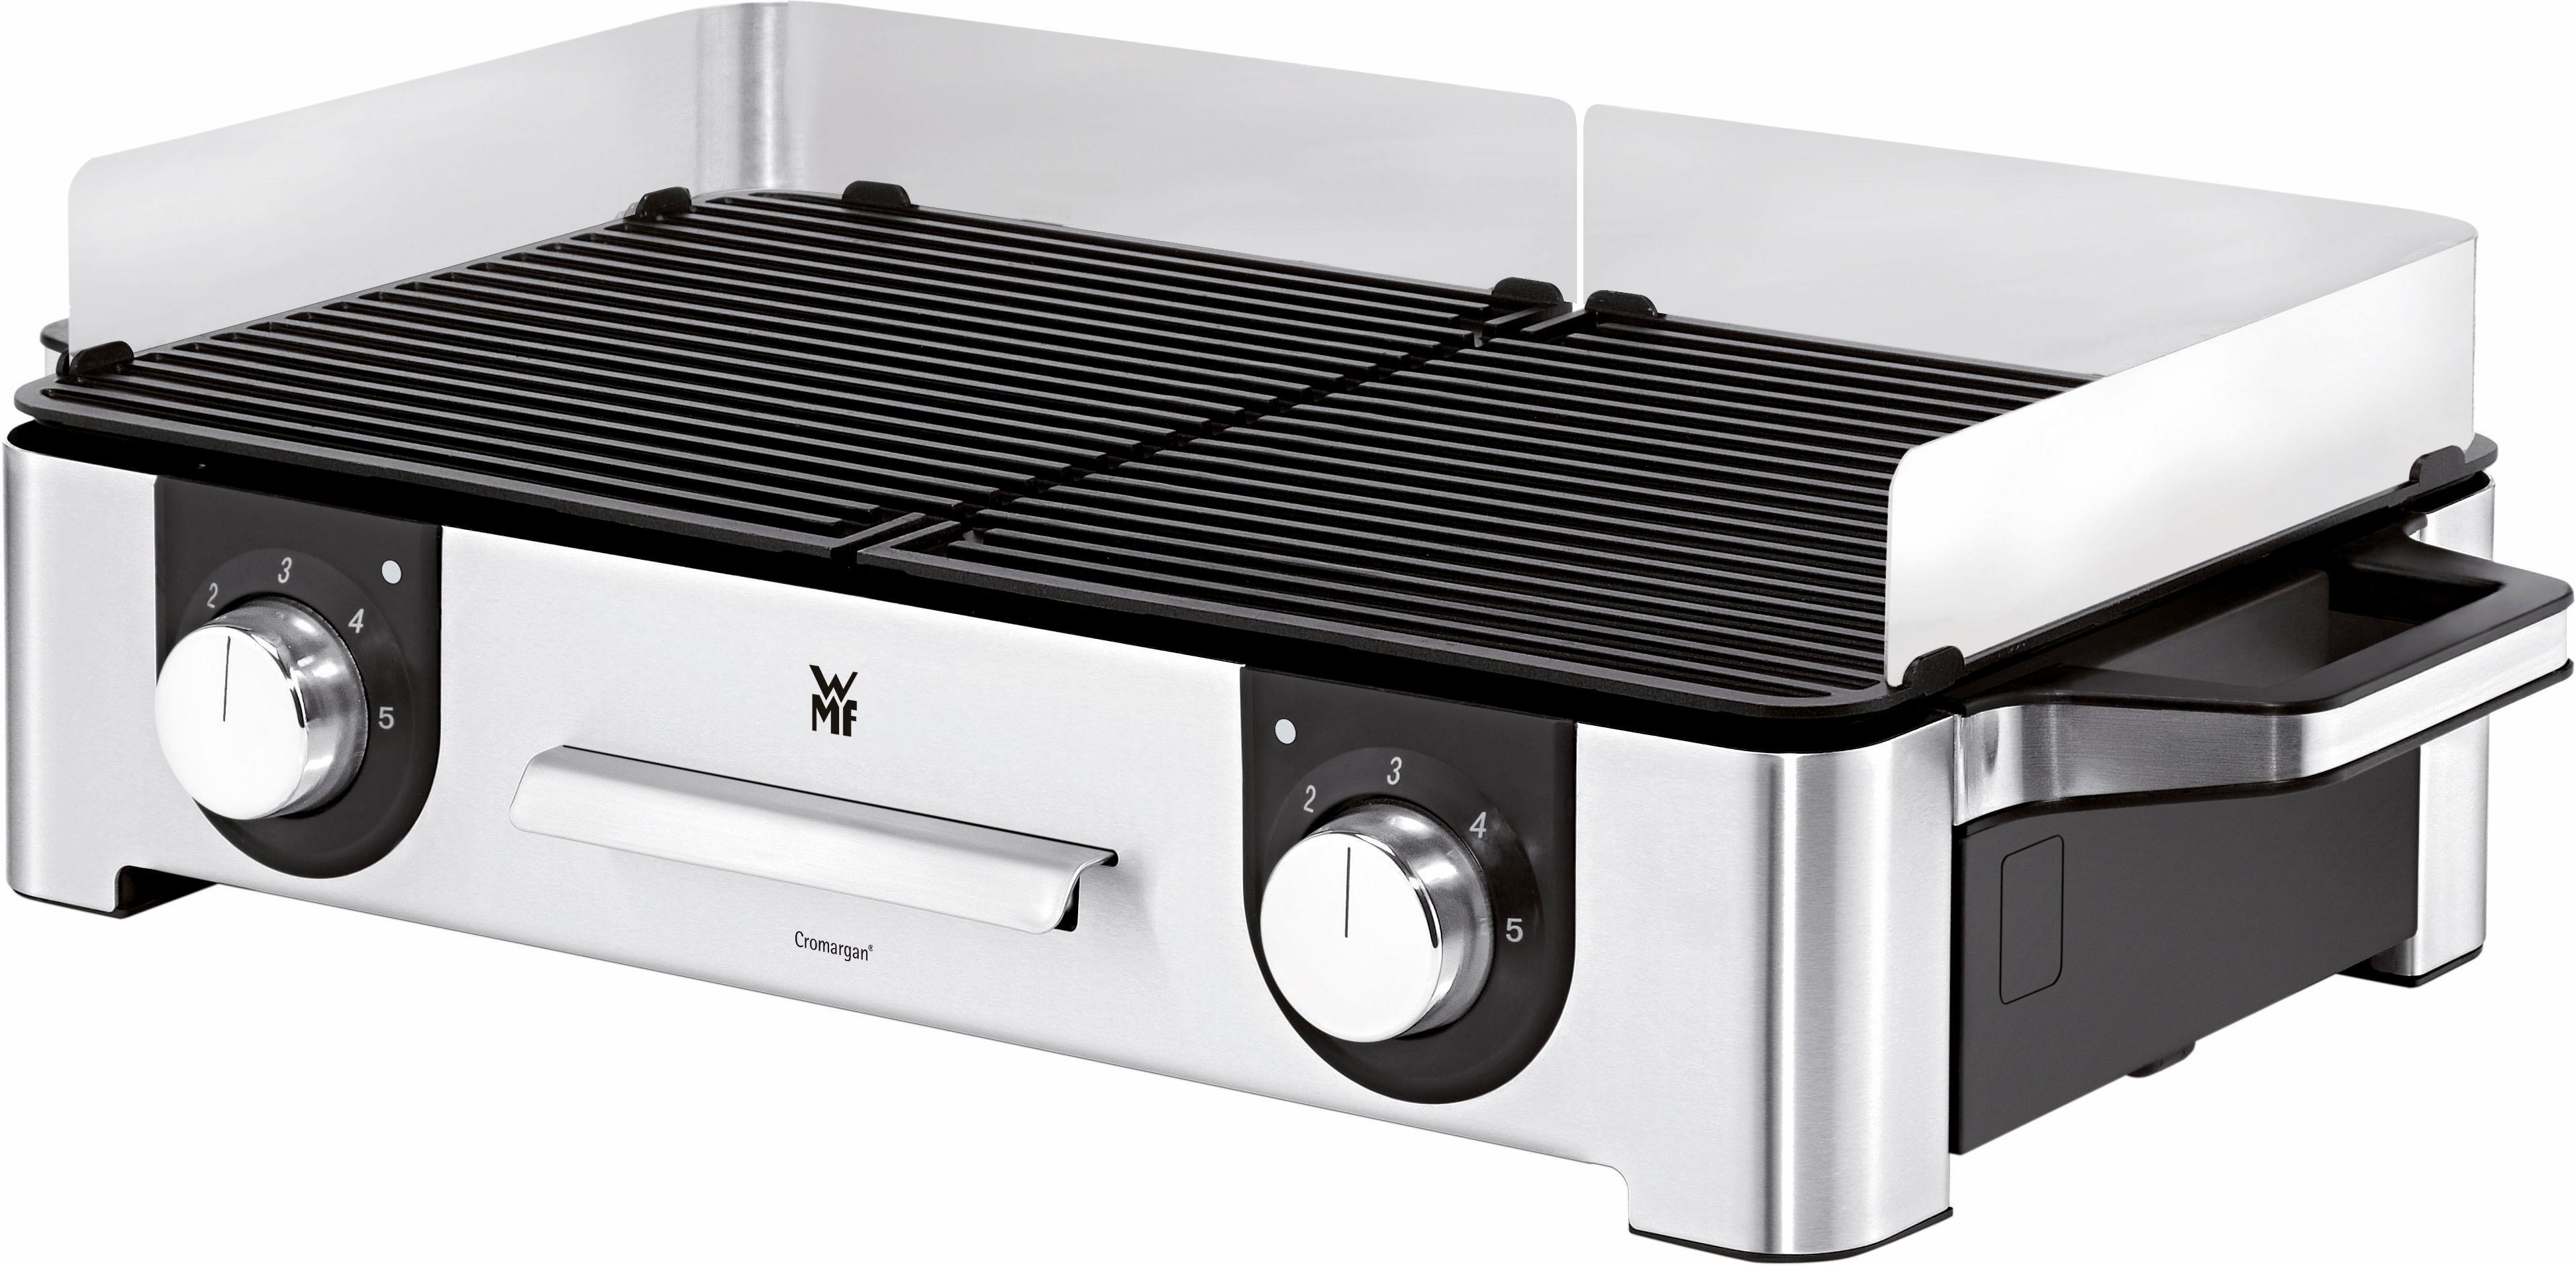 WMF Staande elektrische barbecue LONO Master-grill - gratis ruilen op otto.nl